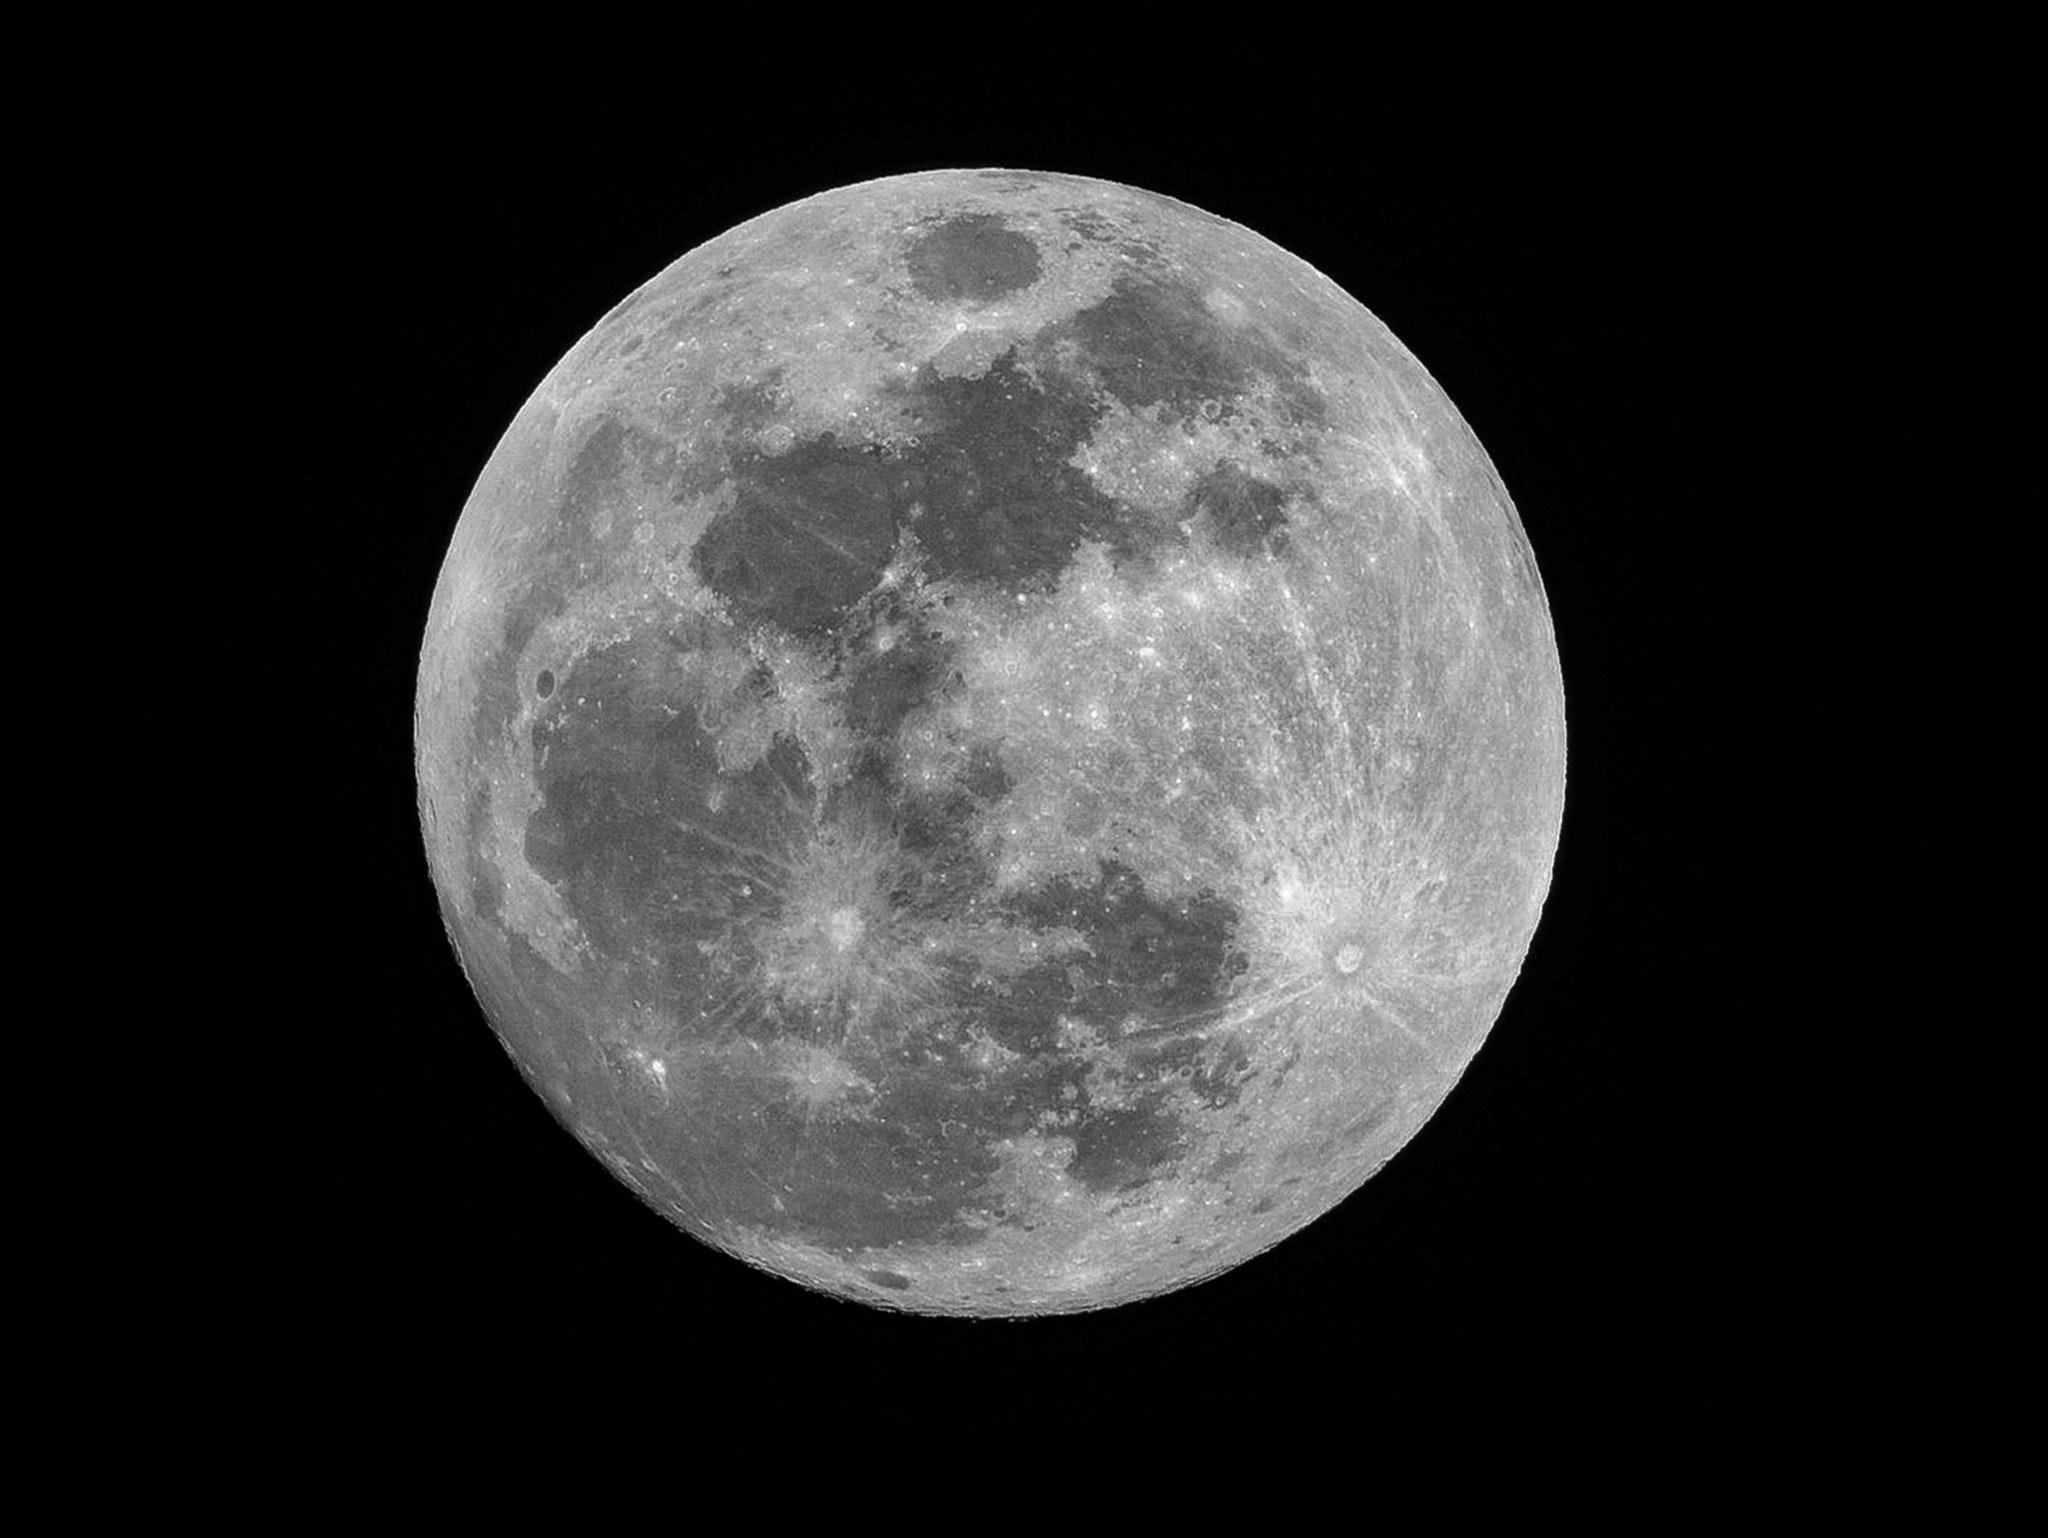 måne, nasa, big (Foto: Unsplash)